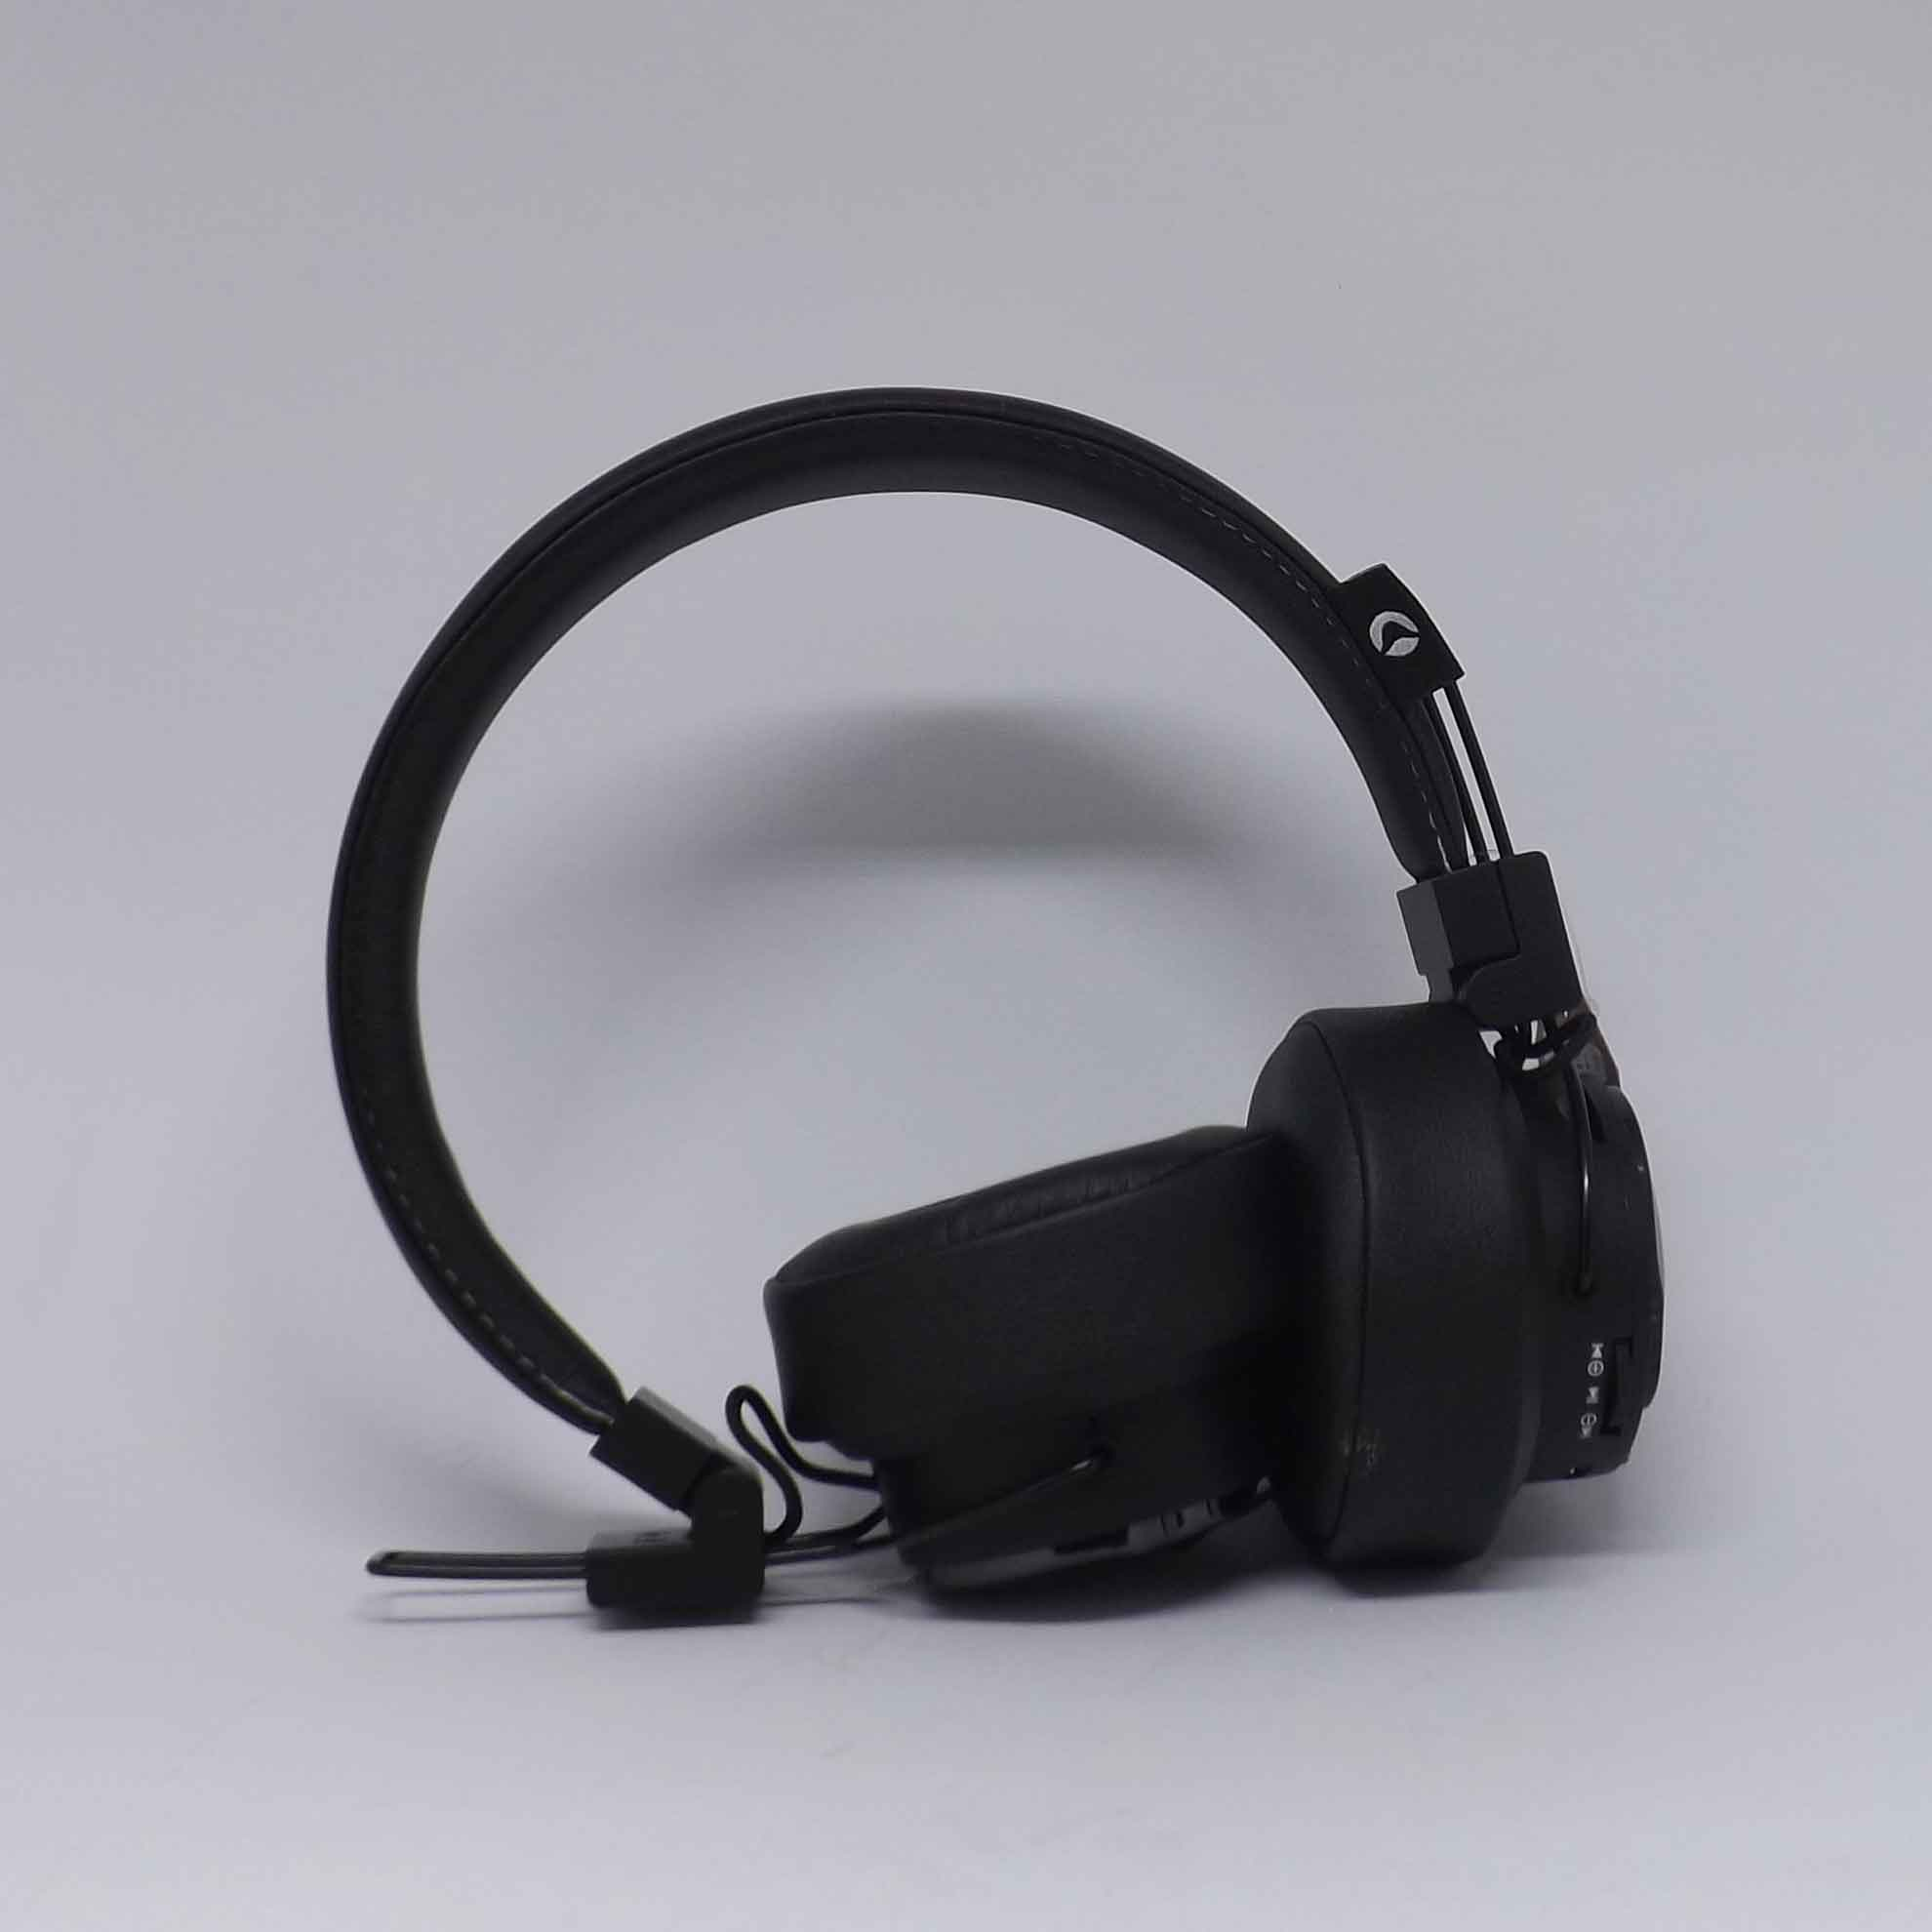 Fone de Ouvido Bluetooth Procover PC-001